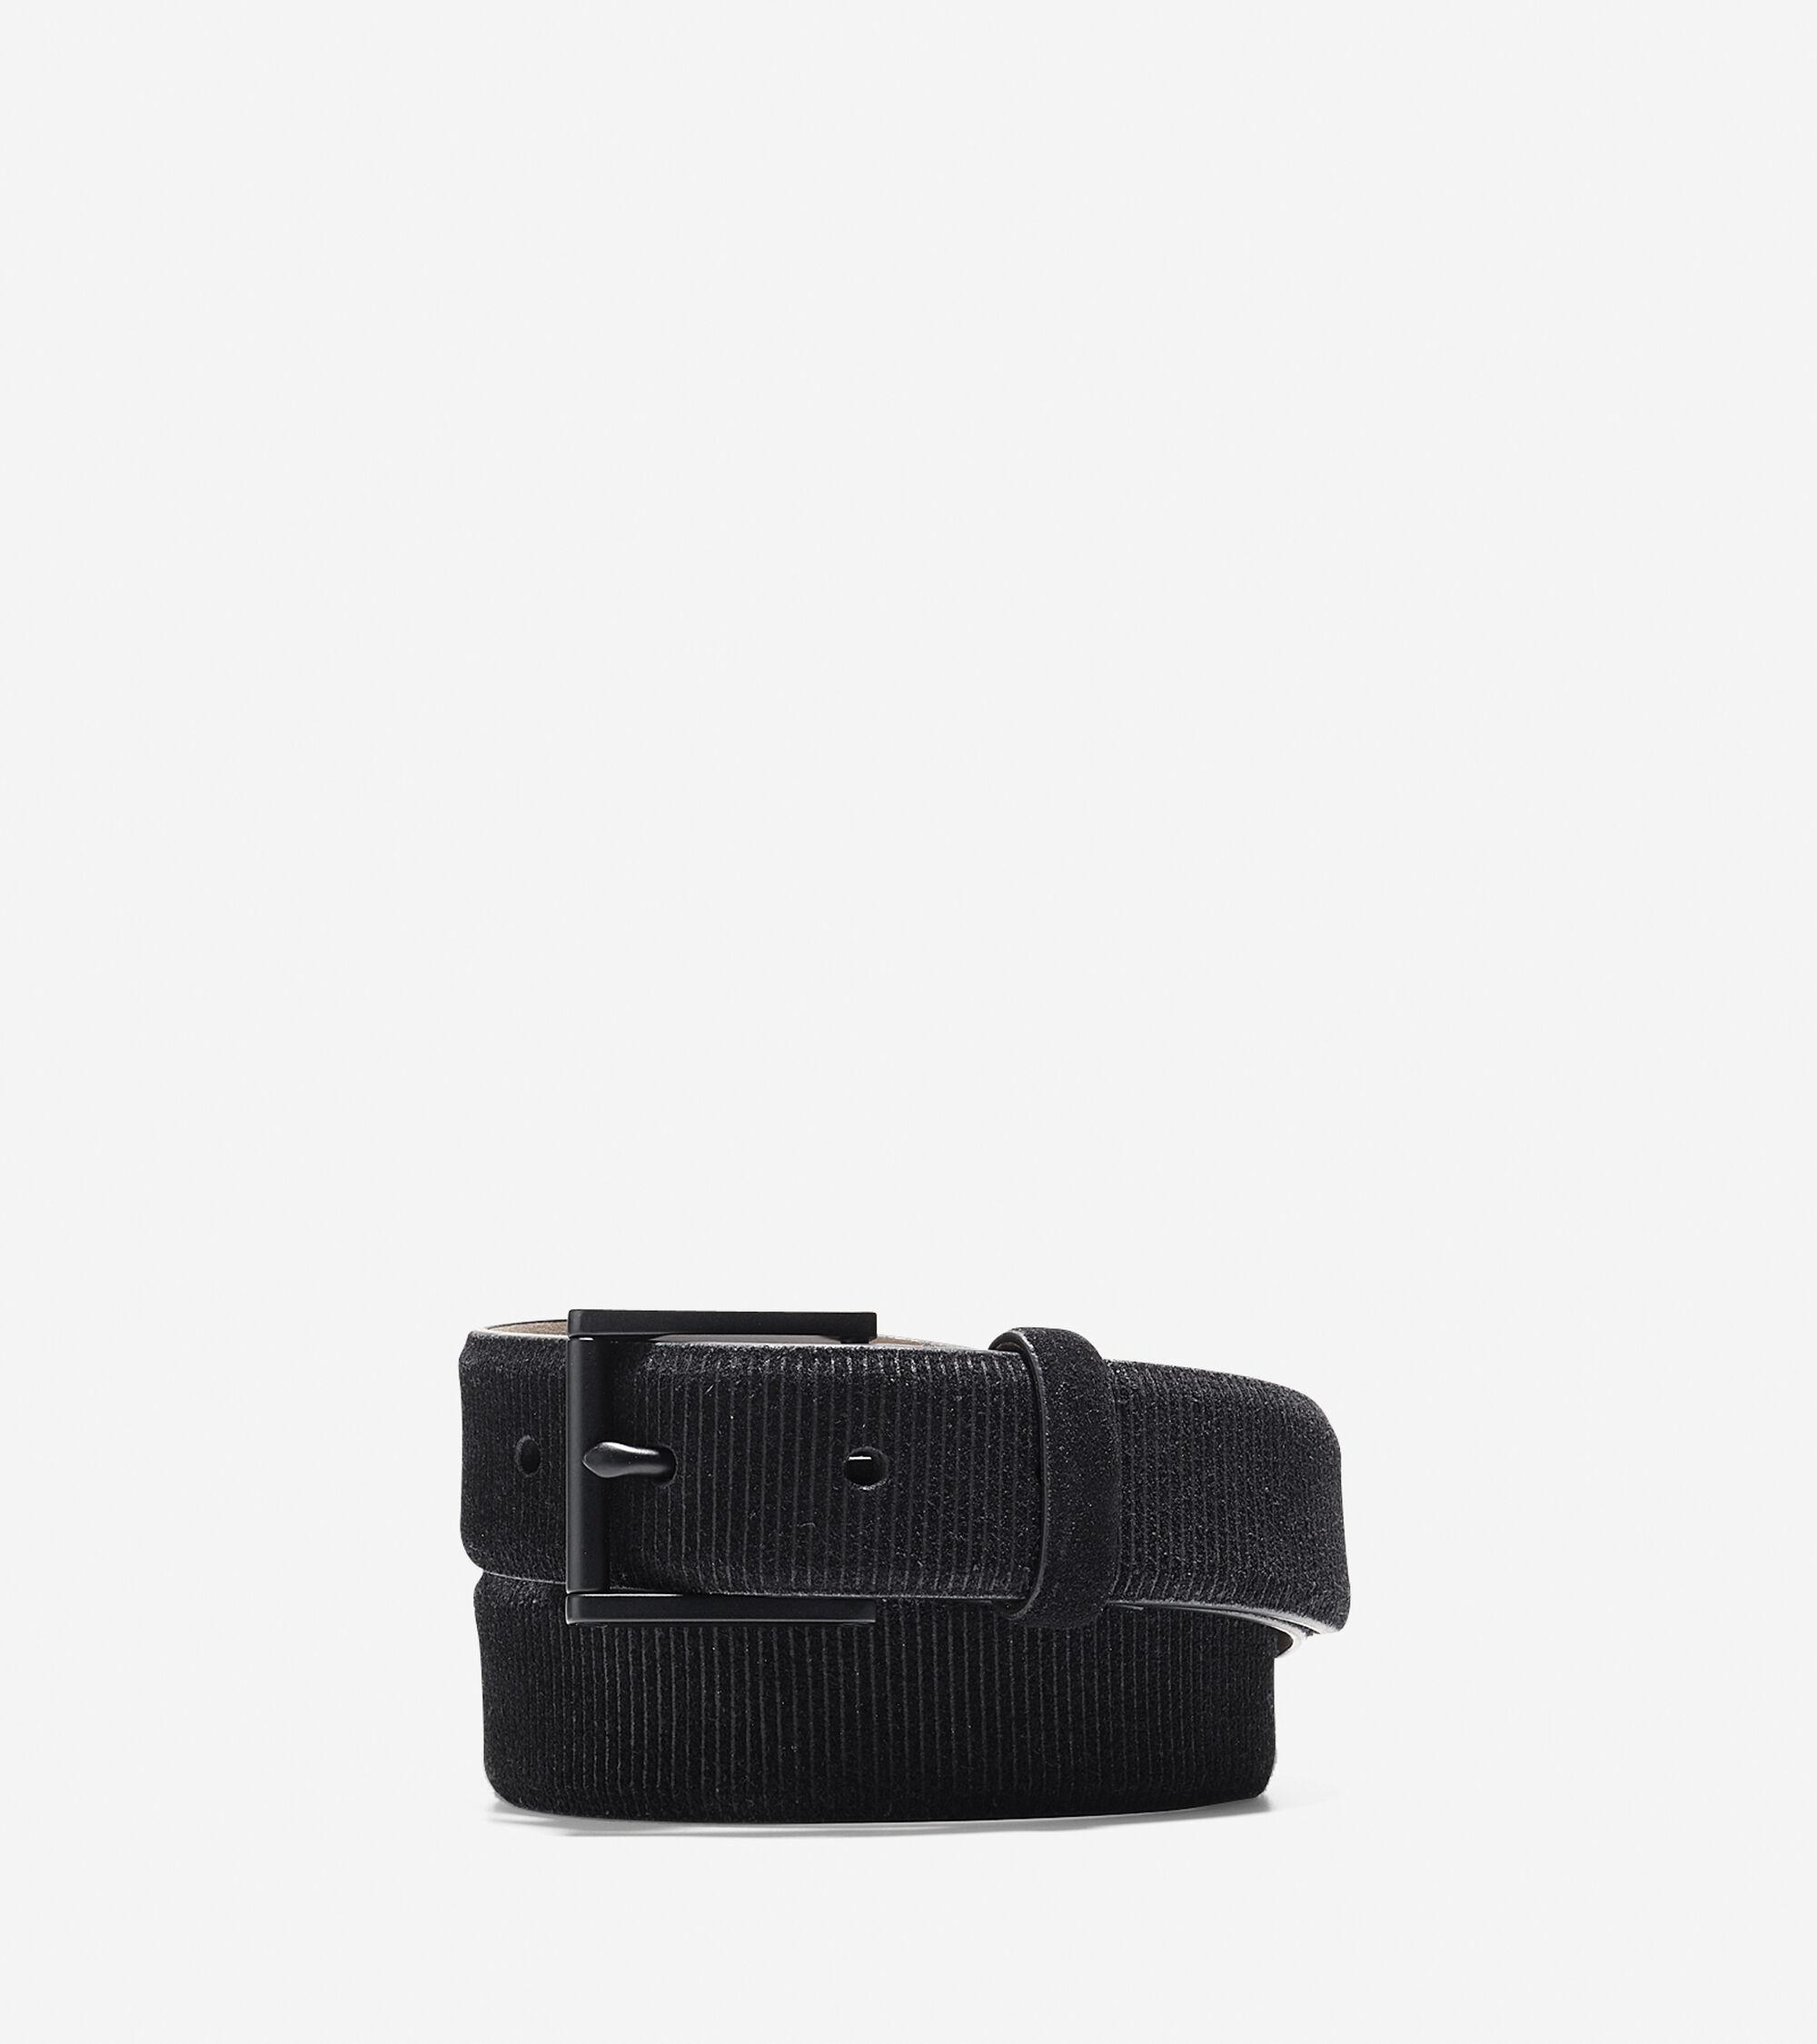 Accessories > 32mm Feather Edge Belt